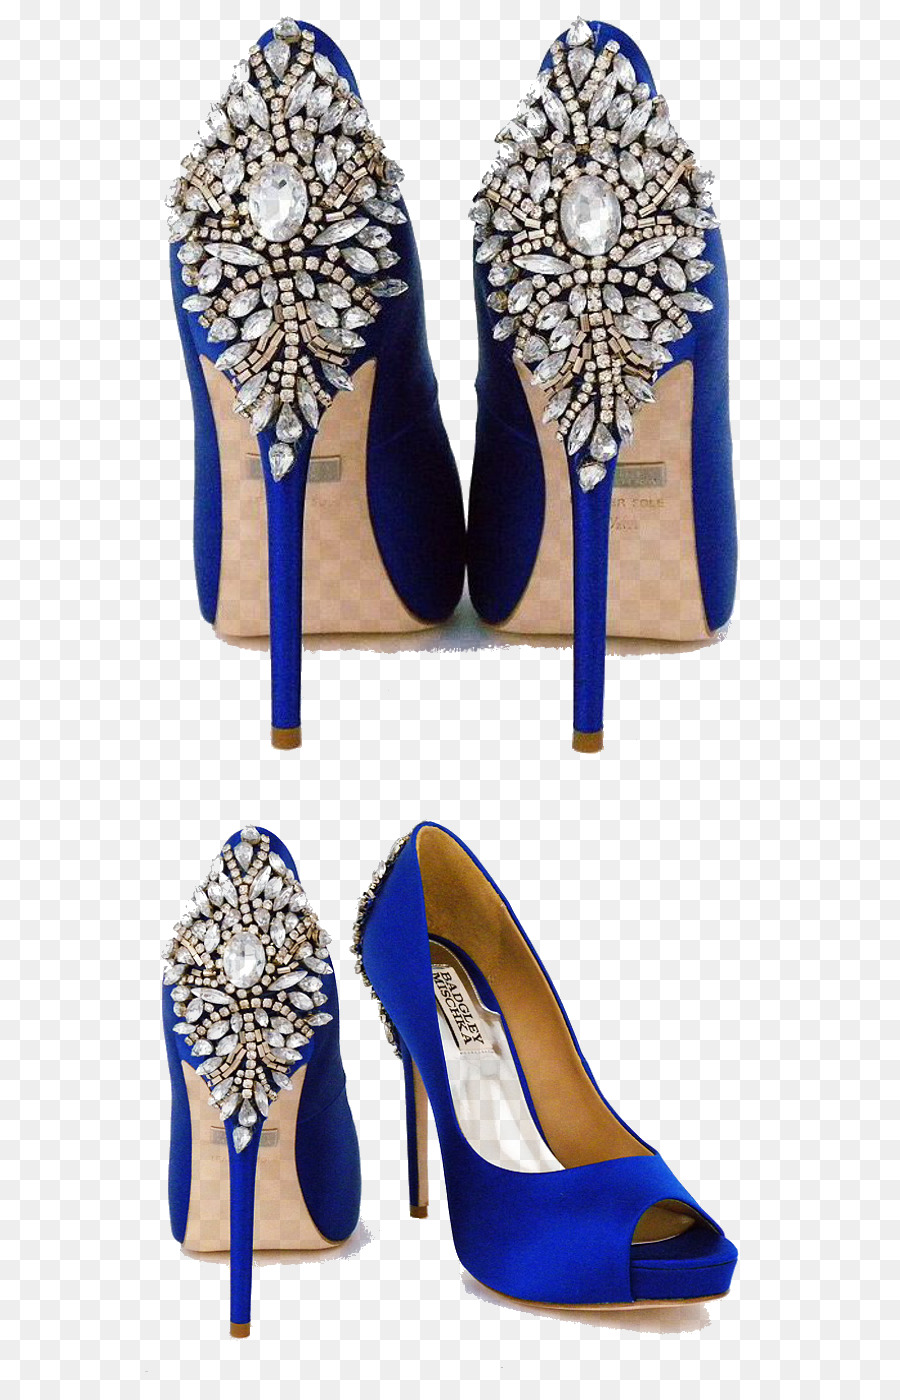 Scarpe Sposa Blu.Scarpa Donna Badgley Mischka Kiara Gioiello Tacco Piattaforma